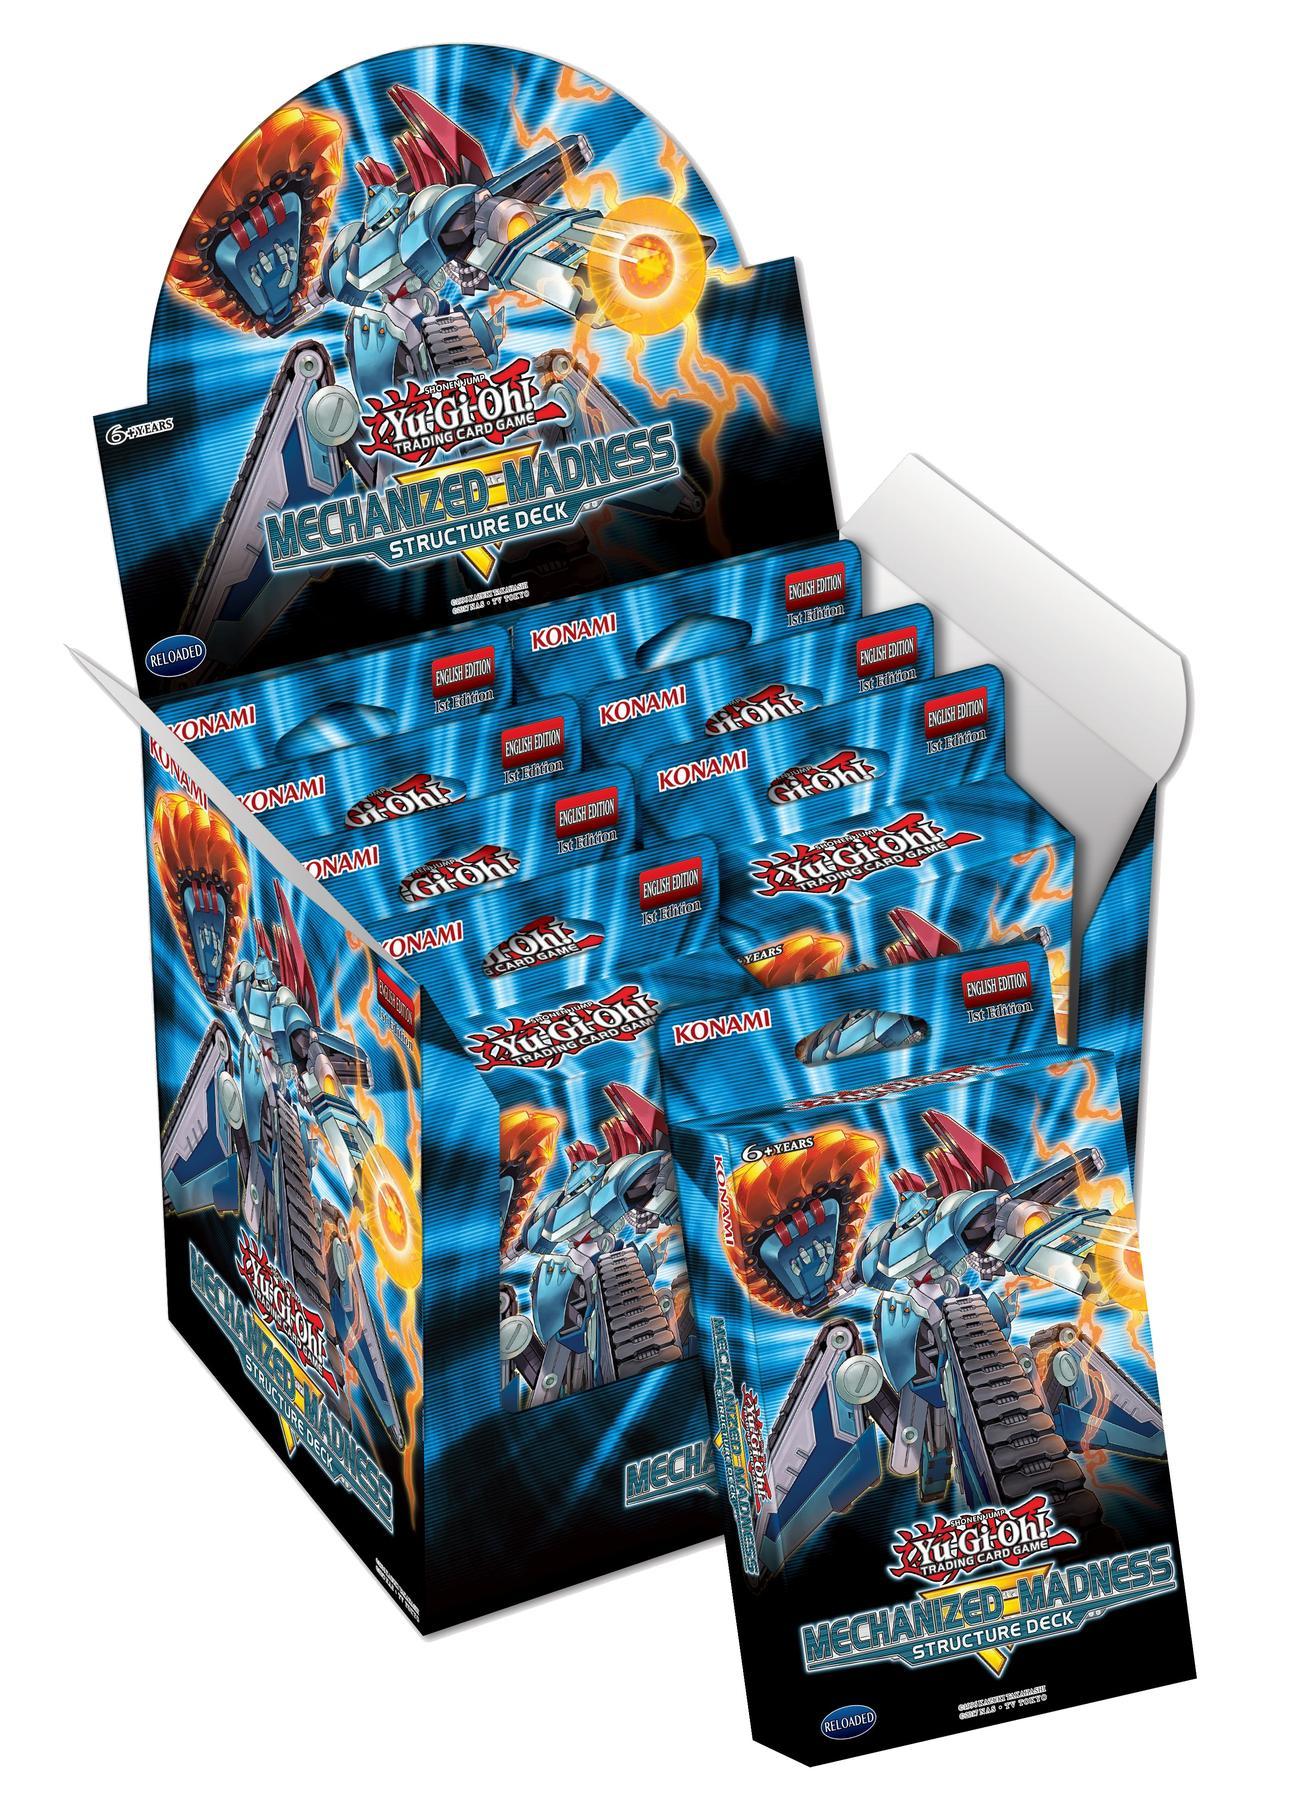 Gadget Soldier LON-010 Yu-Gi-Oh Card Light Play